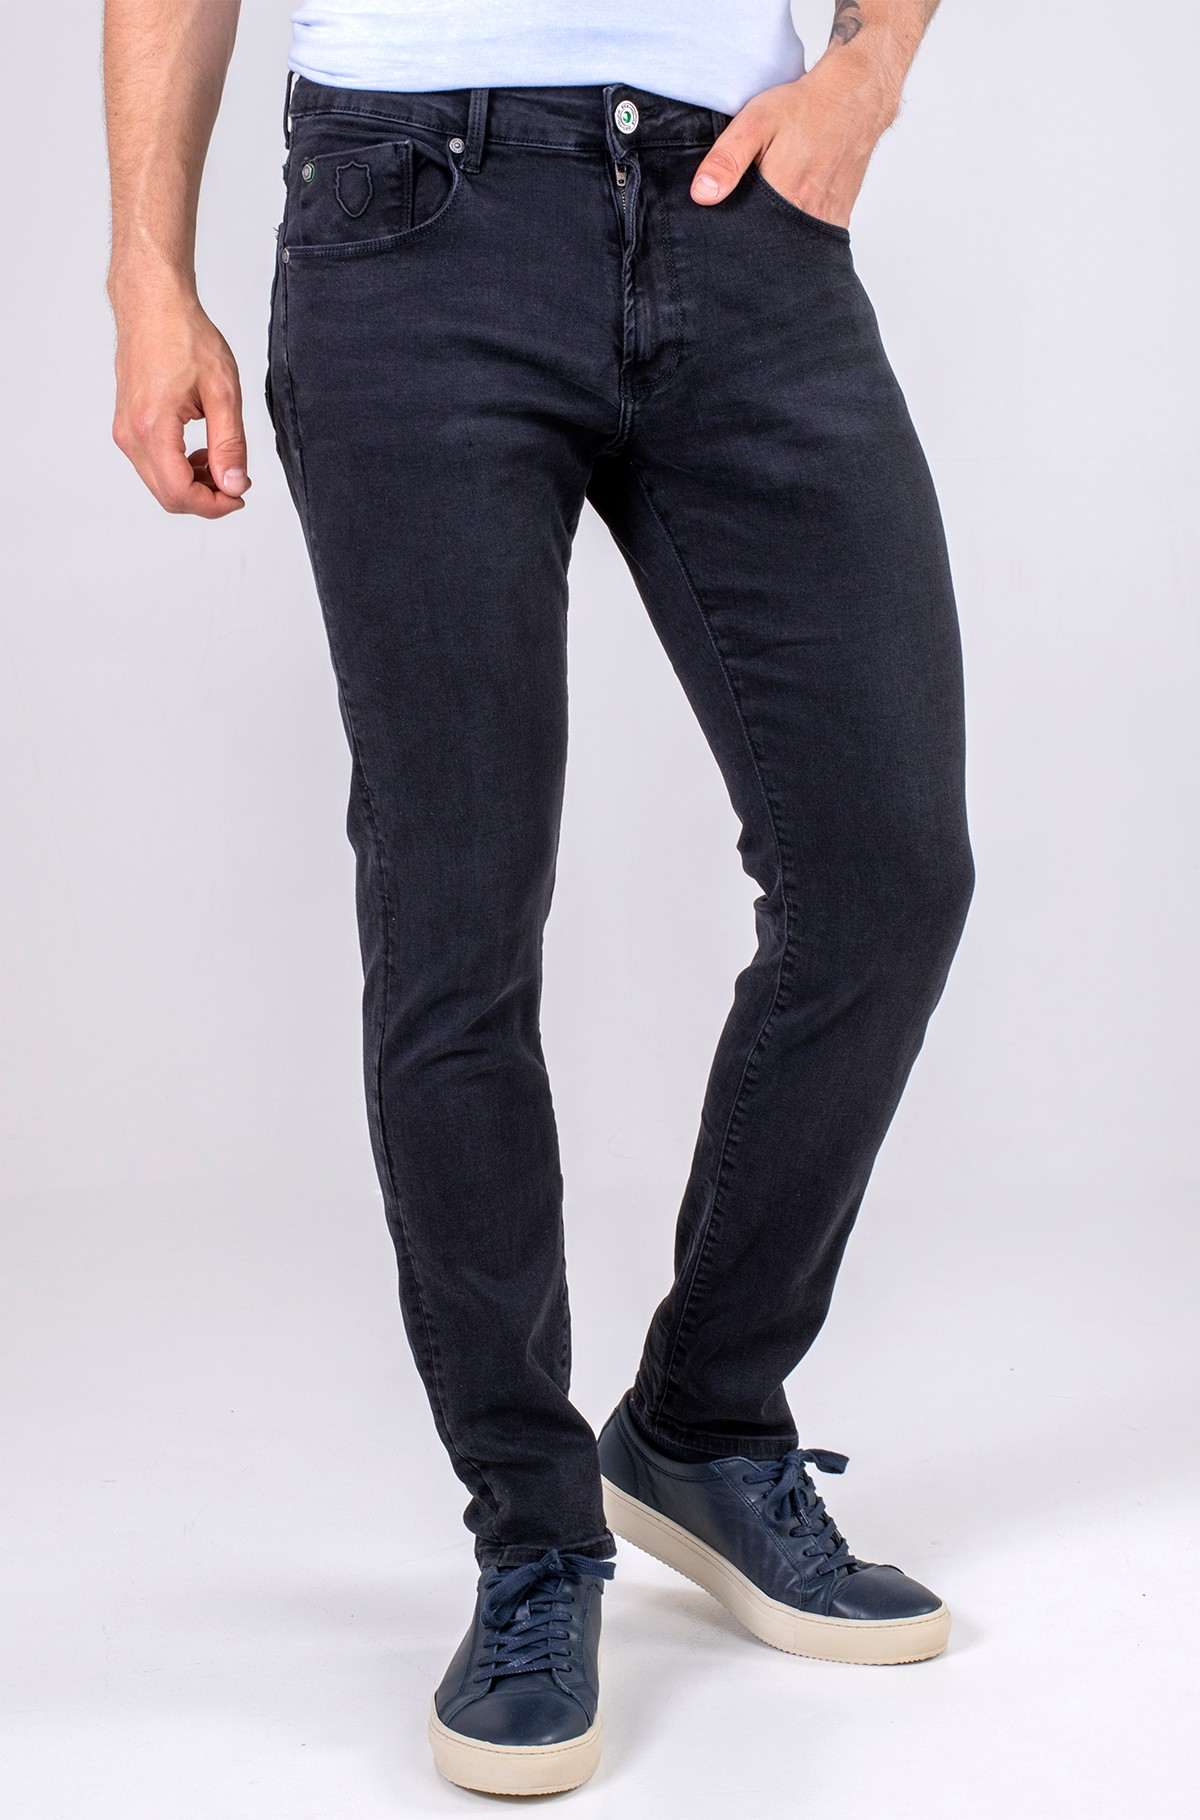 Jeans MORIARTY LAK 409-full-1